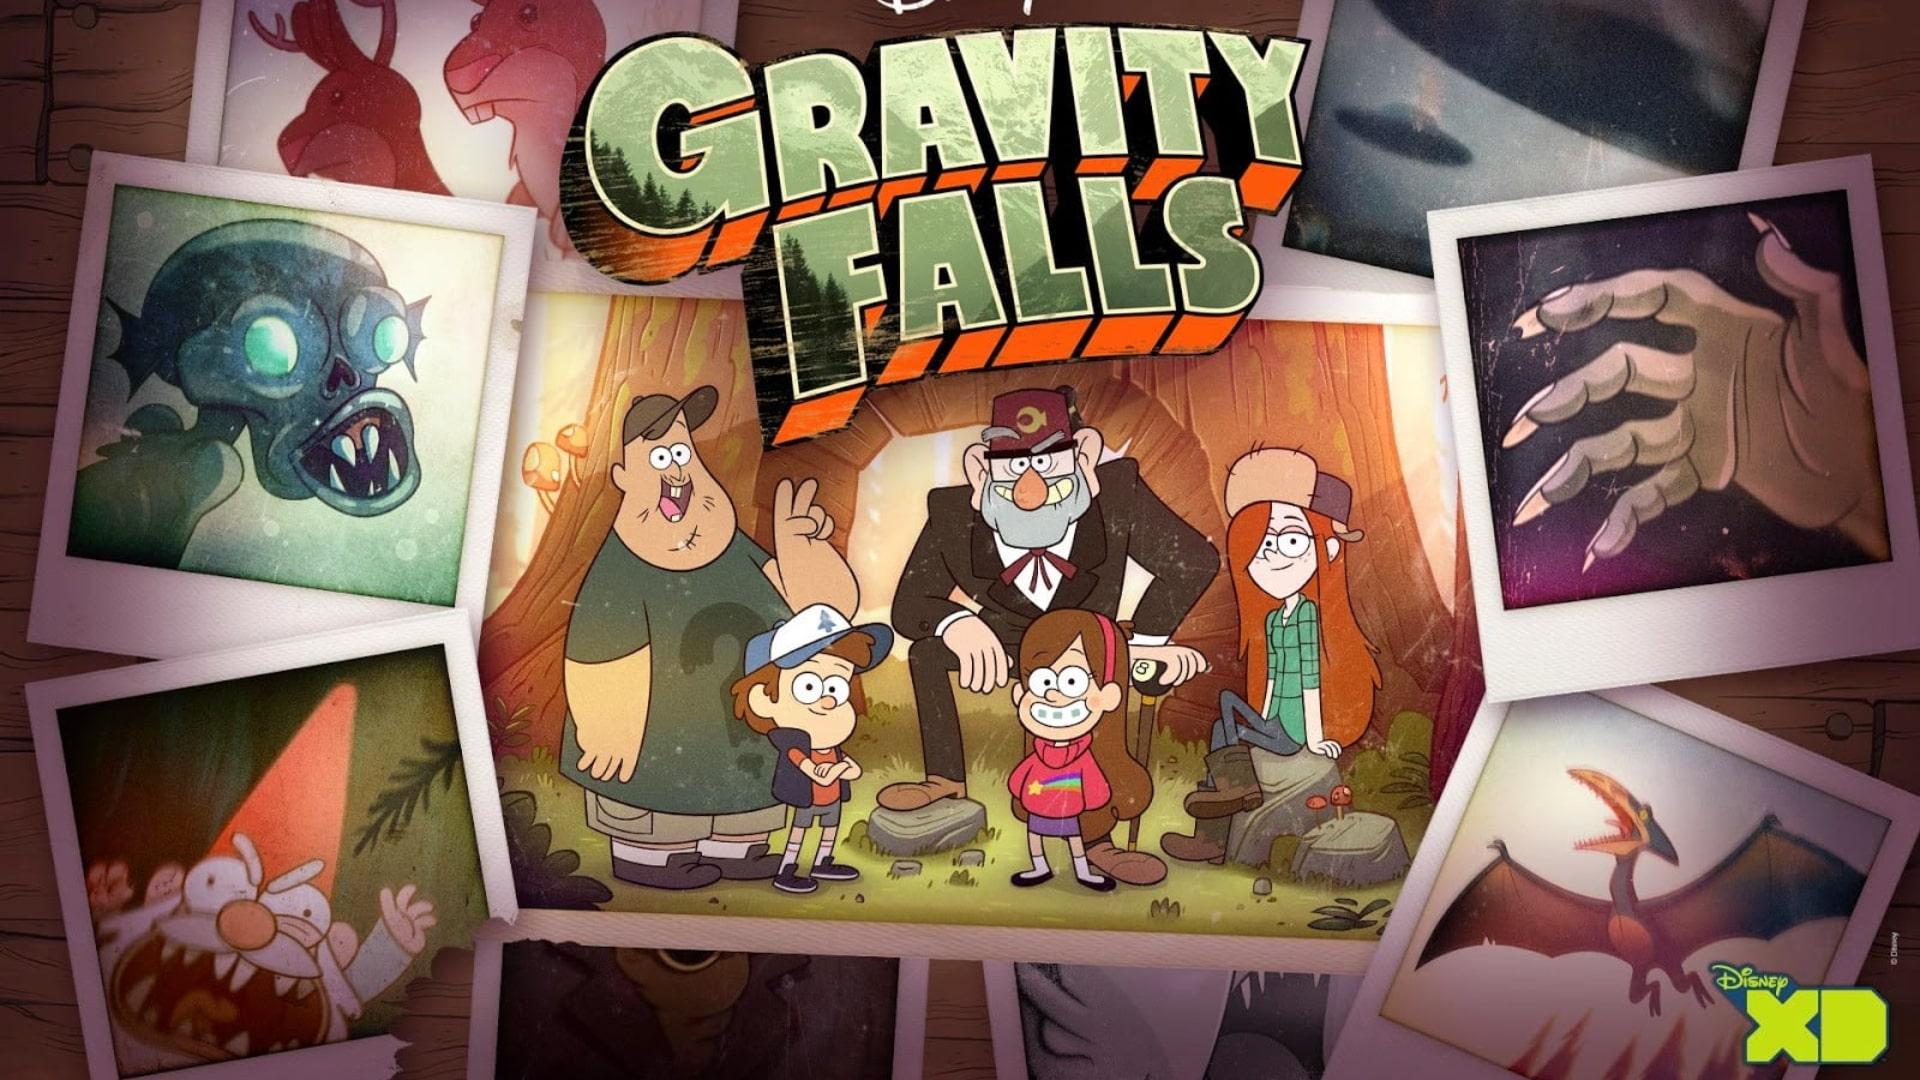 Gravity Falls Season 1 All Episodes Download